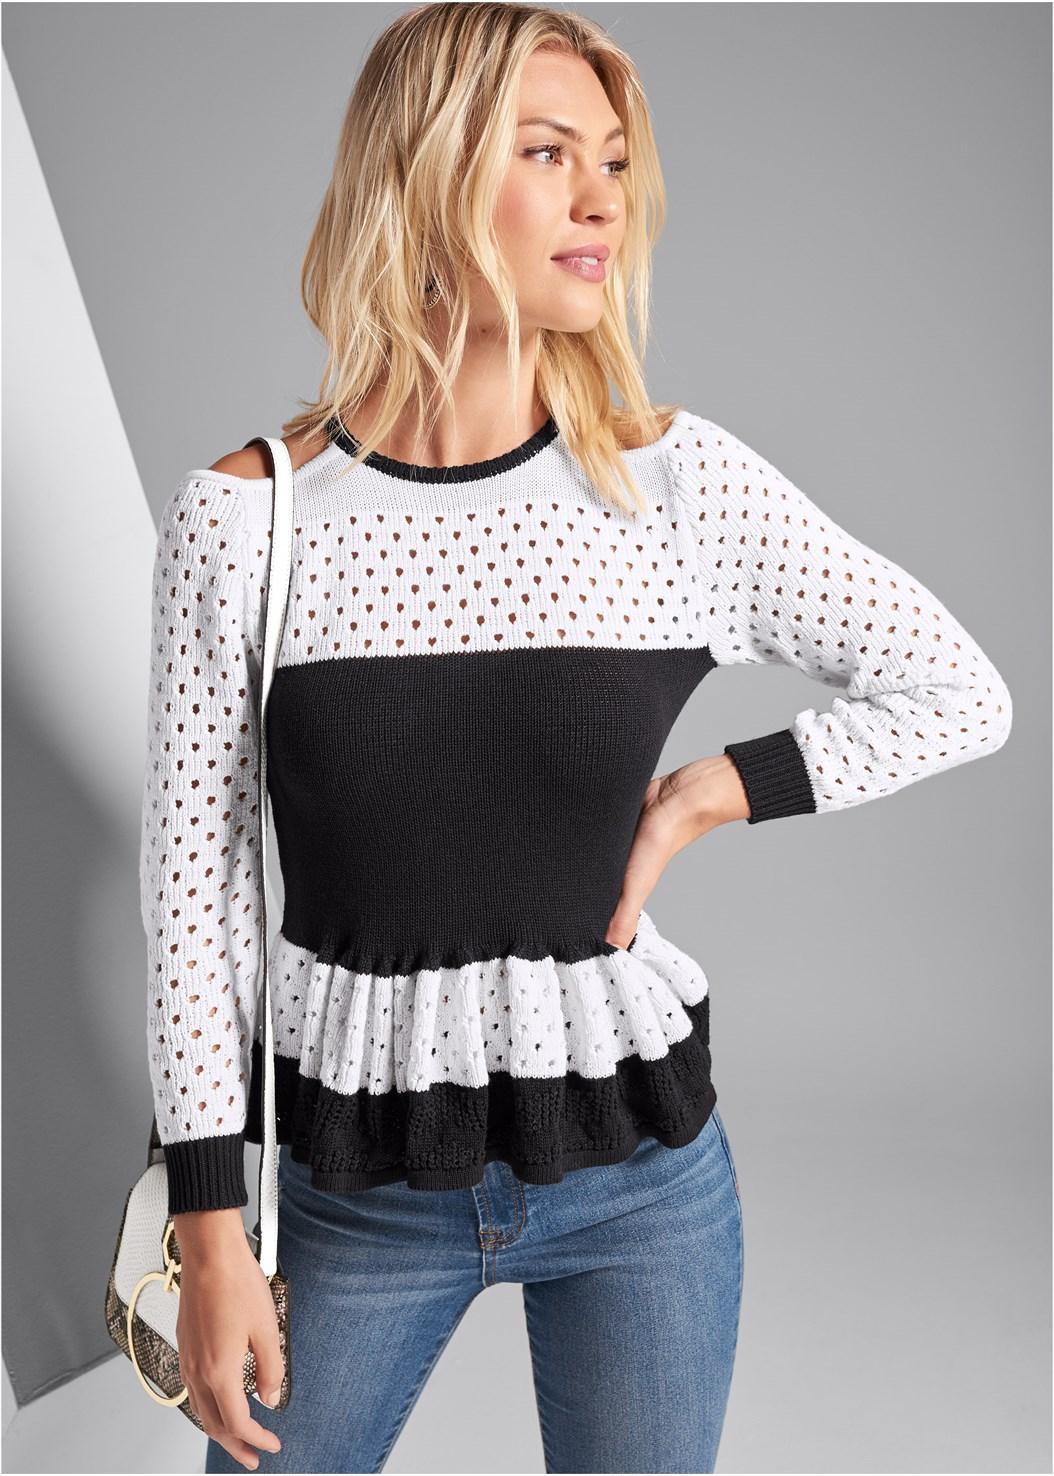 Ruffle Hem Sweater,Ripped Skinny Jeans,Beaded Hoop Earrings,Print Detail Handbag